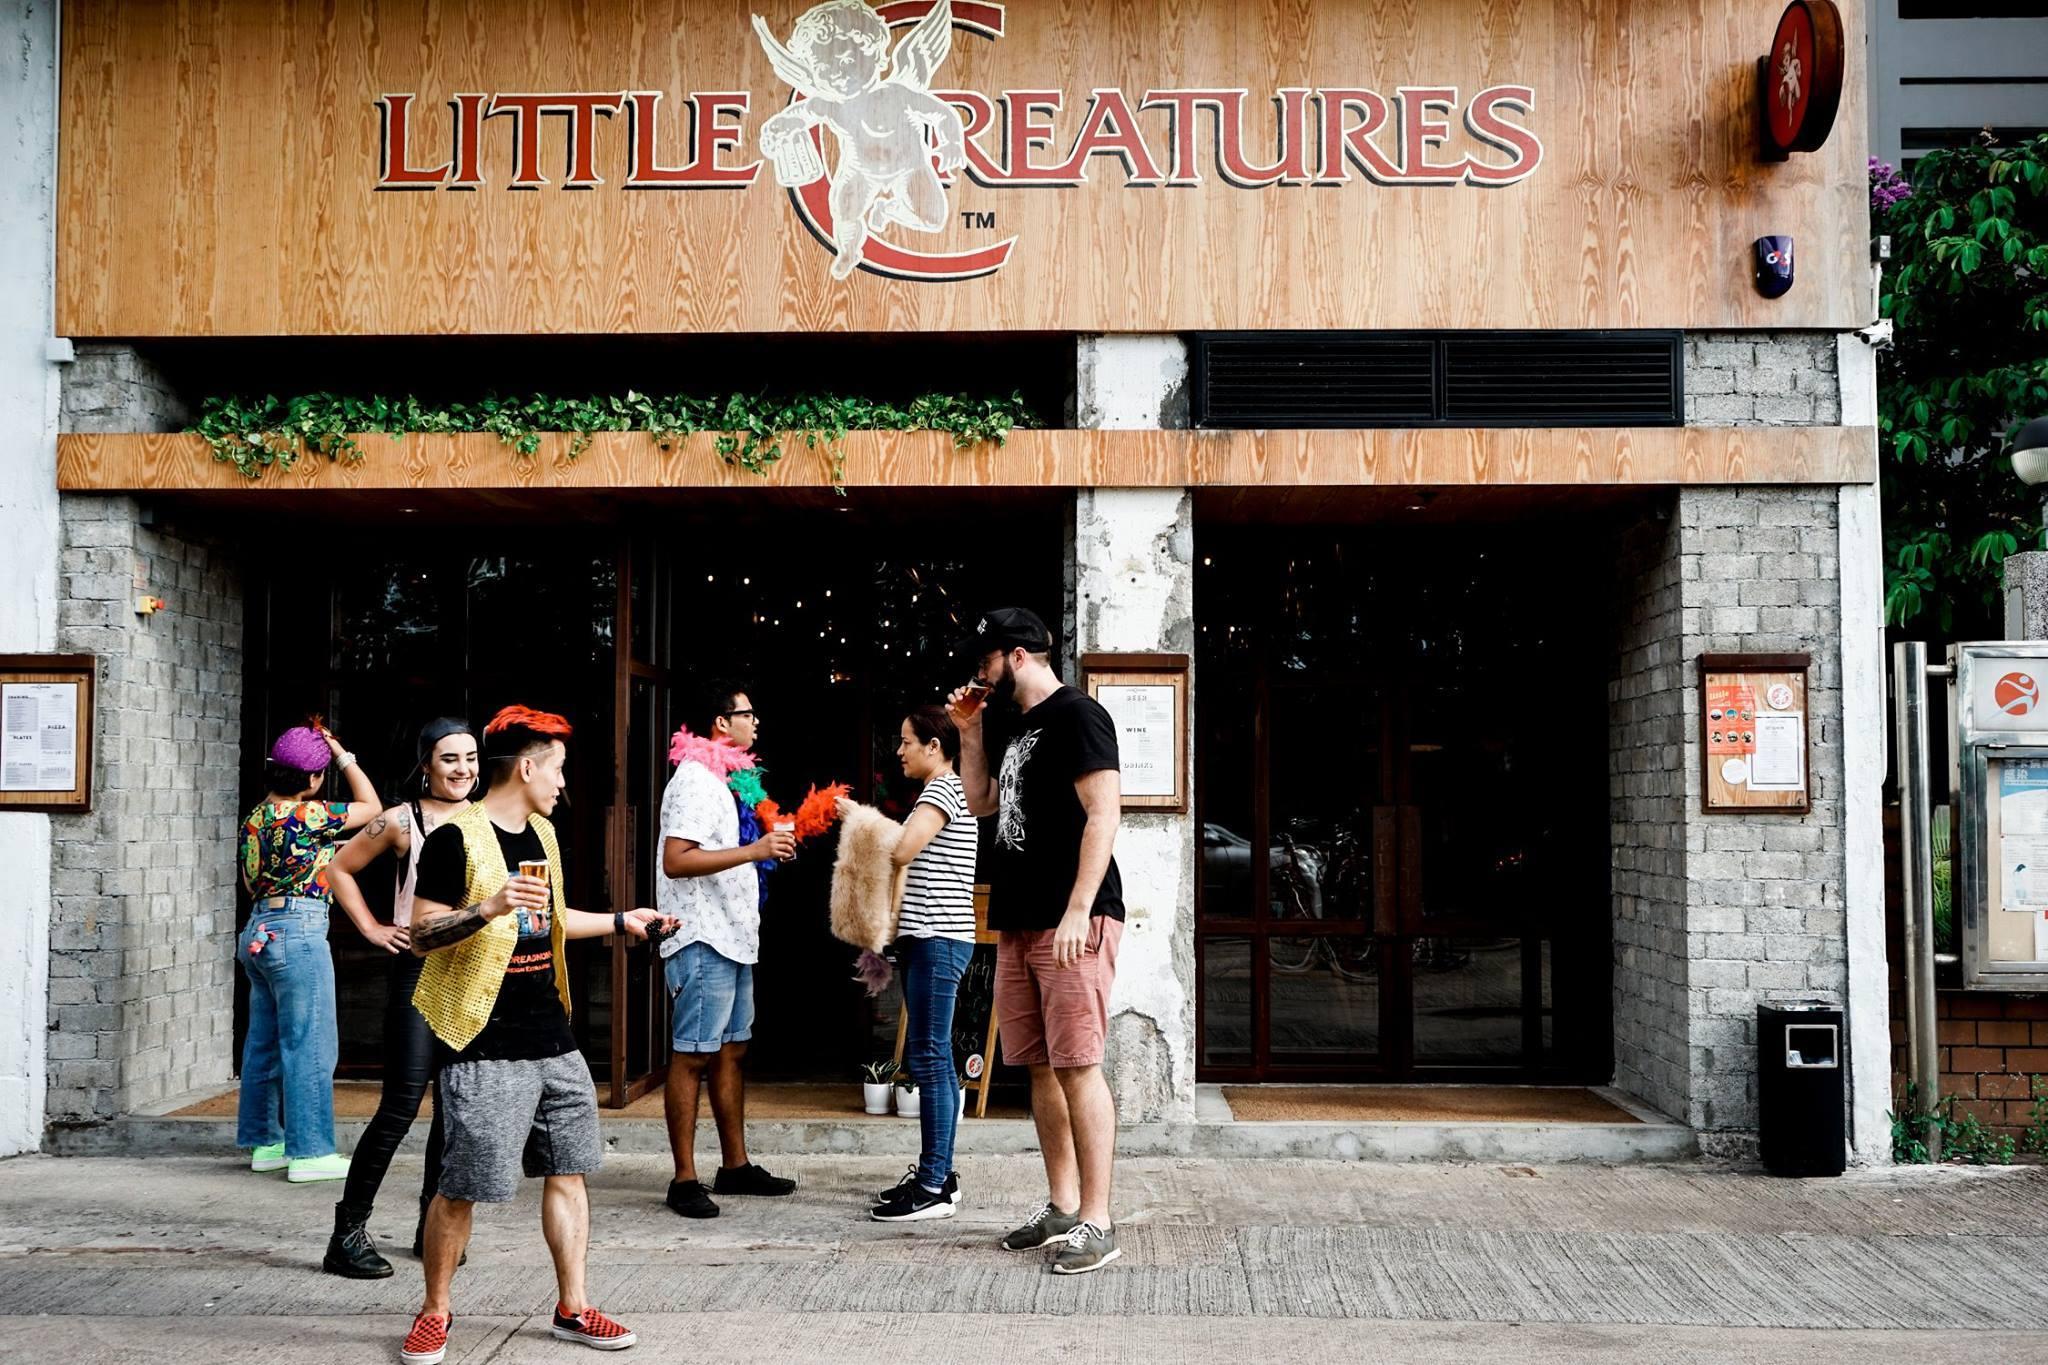 Little Creatures storefront